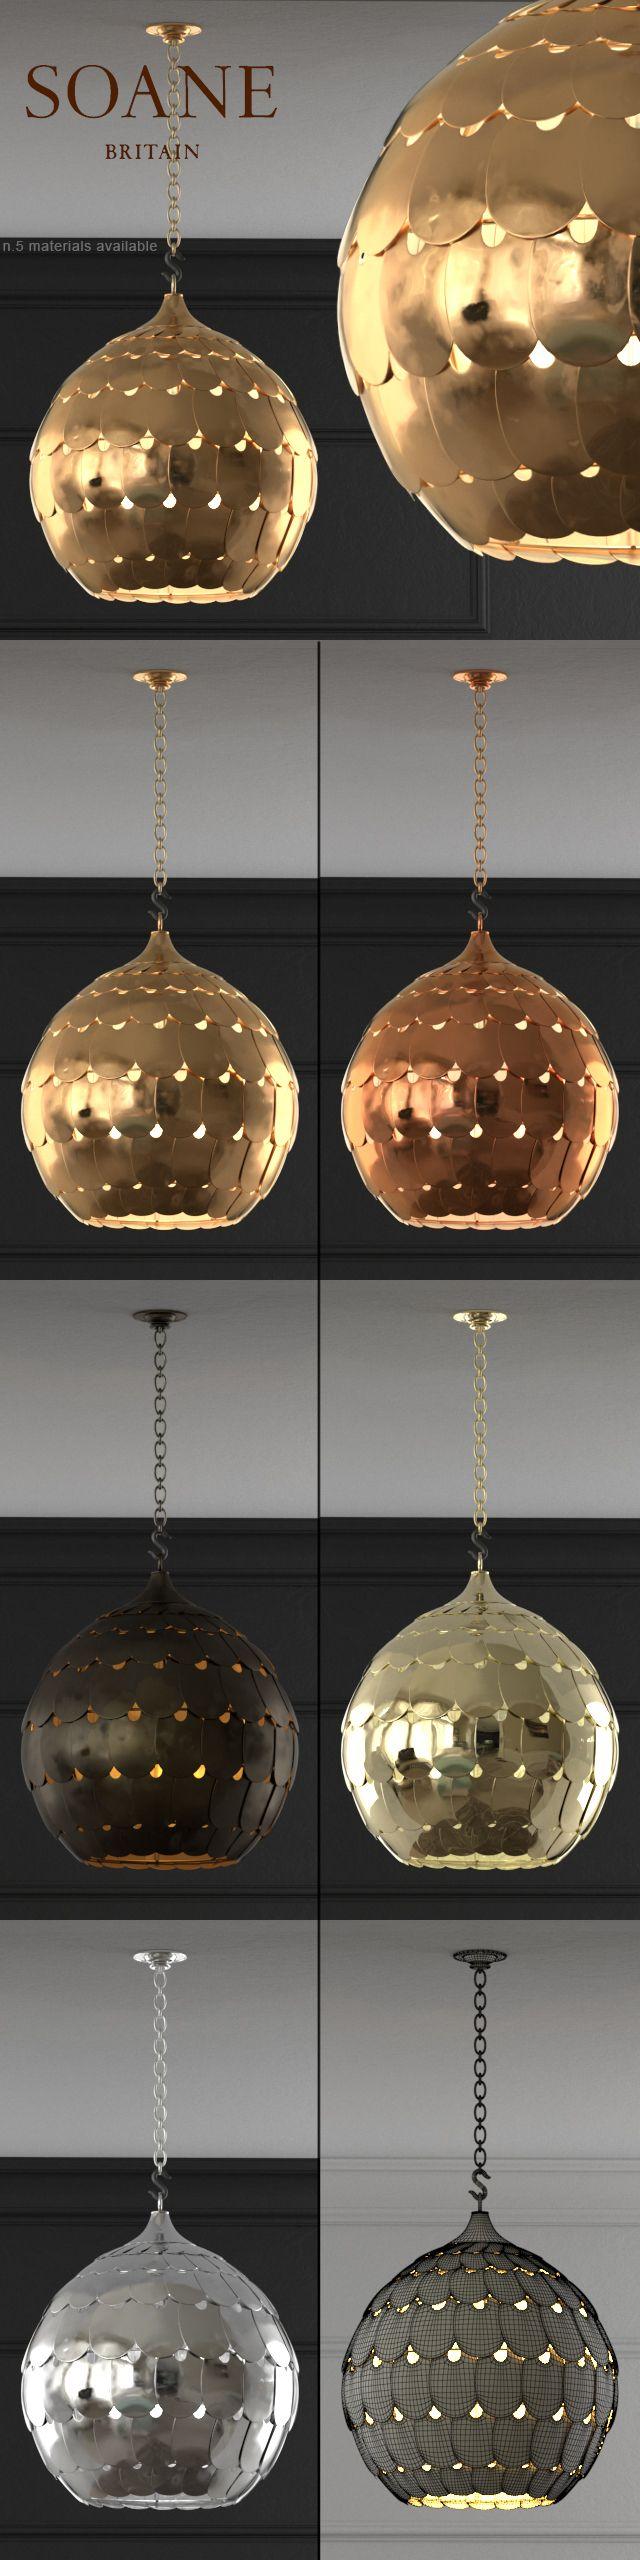 The Owl Lantern - by Soane Britain - 3D model